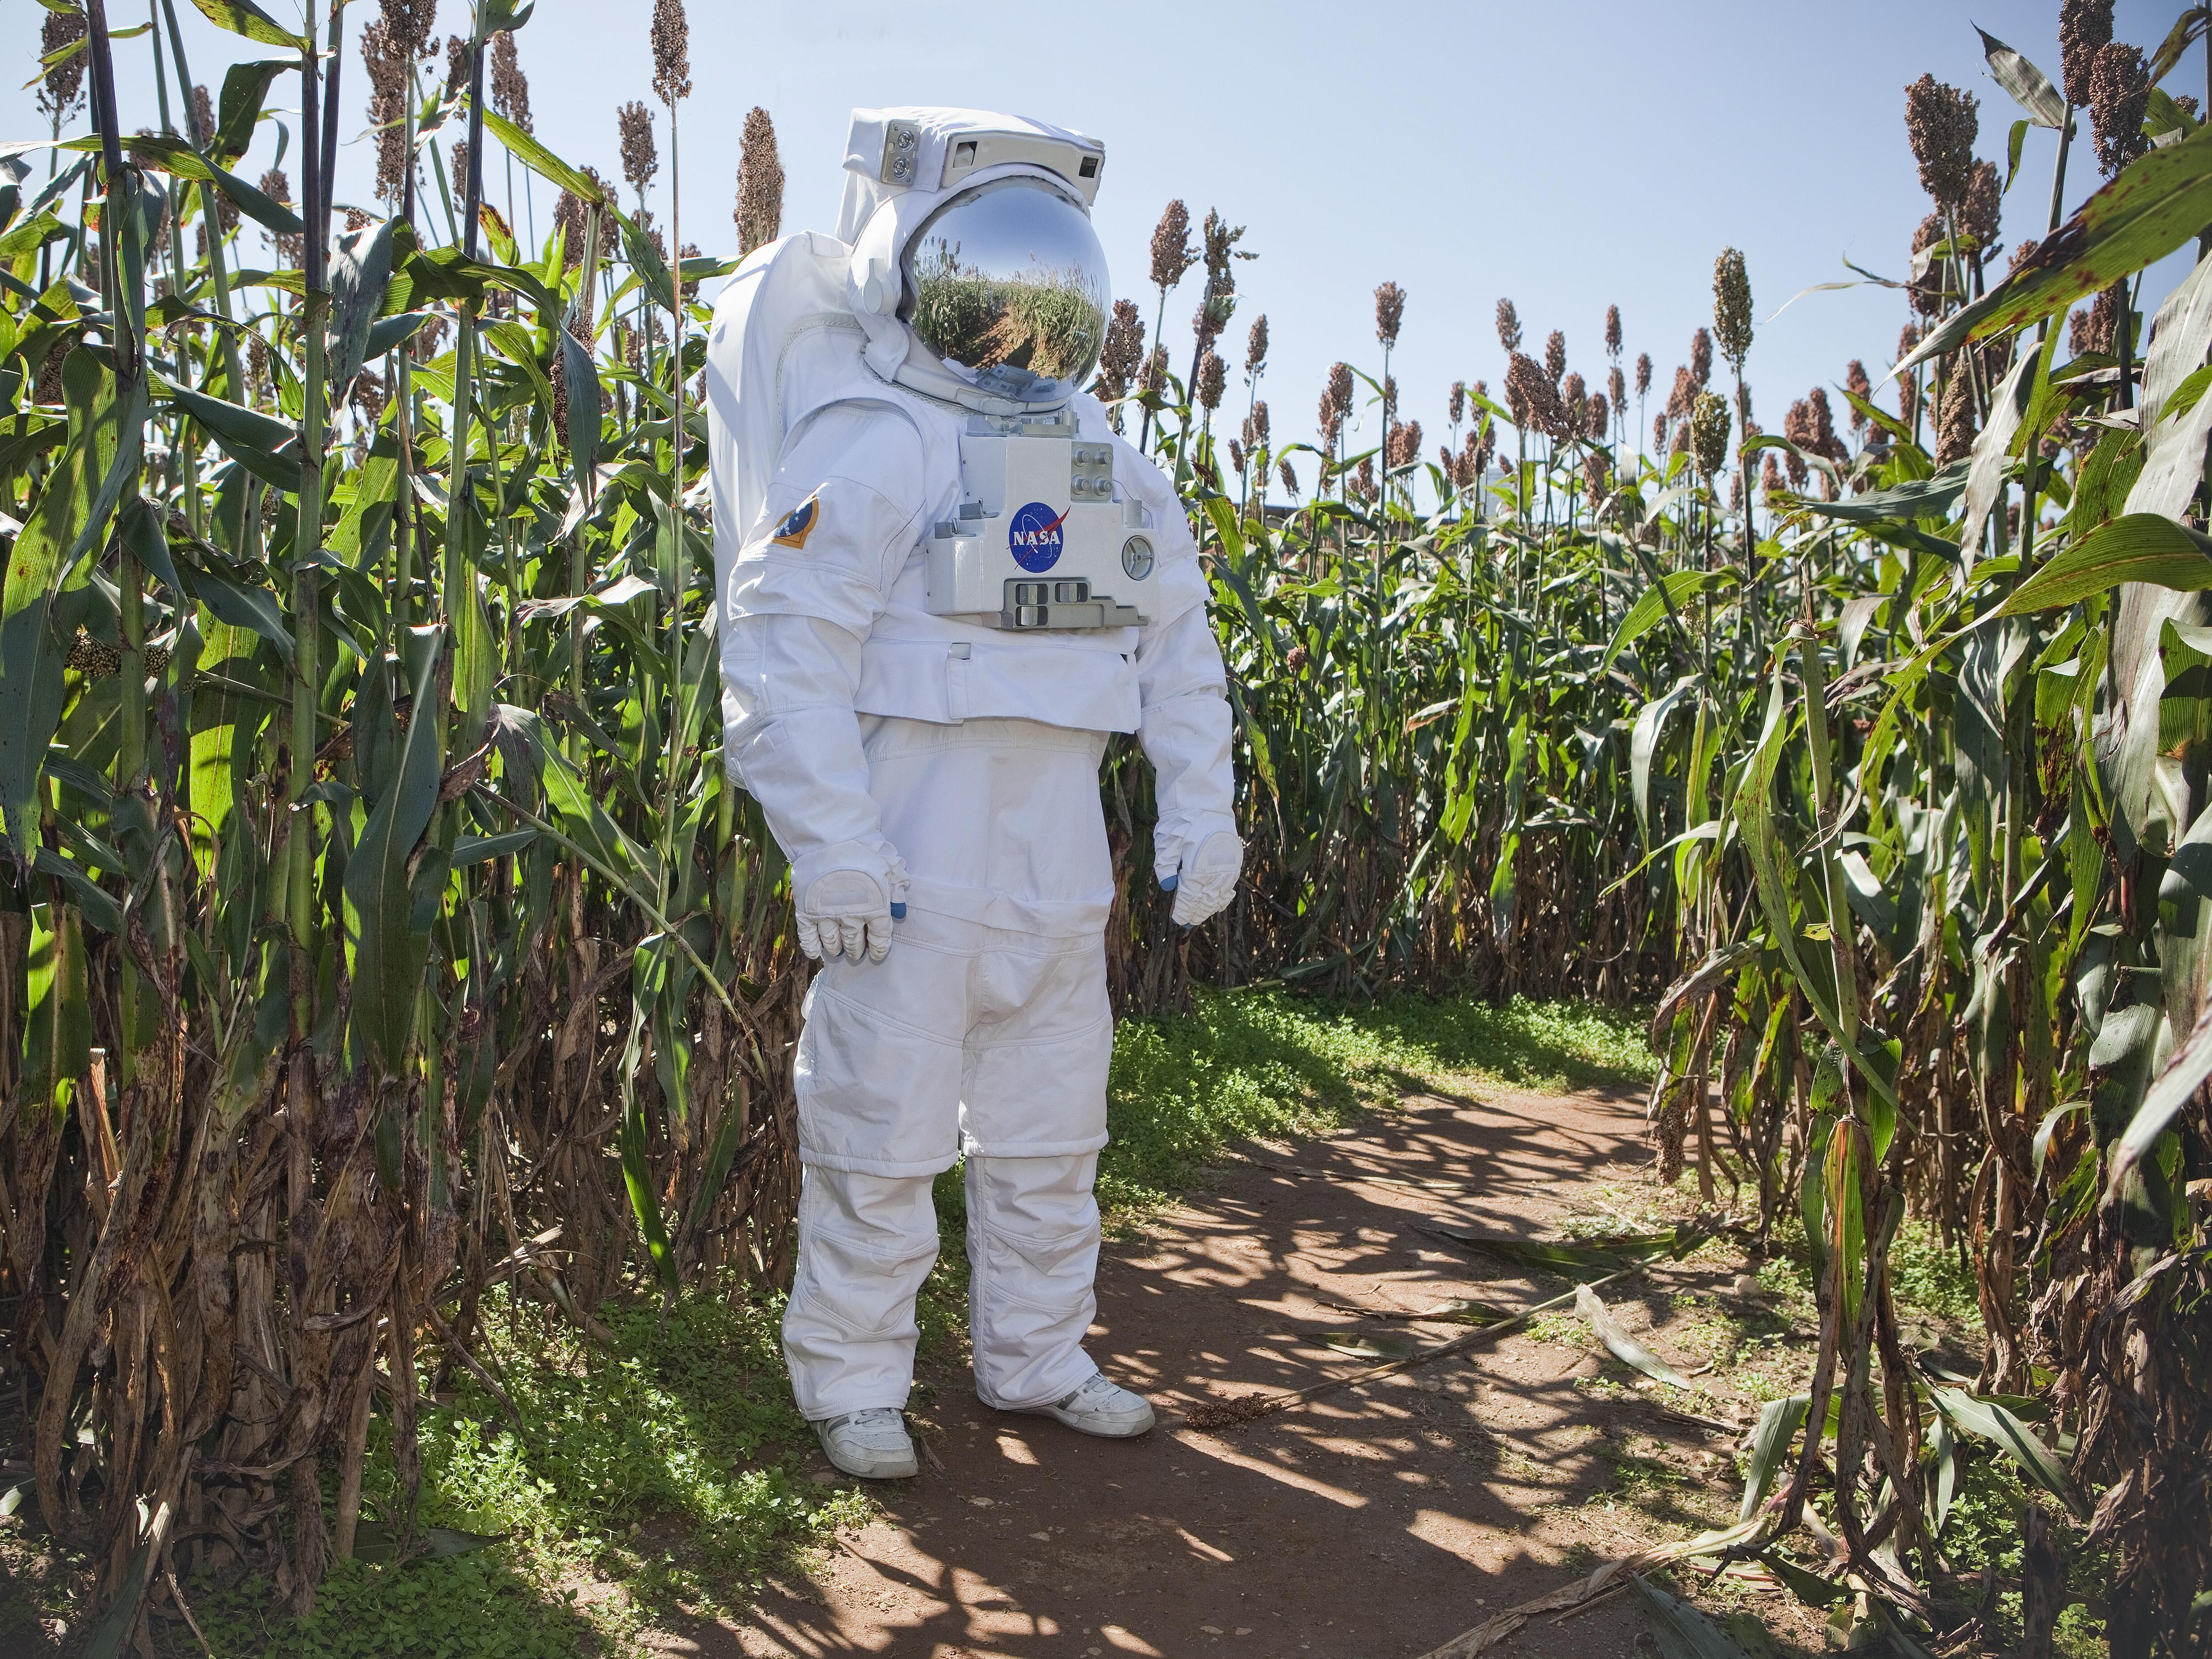 Space Farm - Belvedere Plantation | NASA